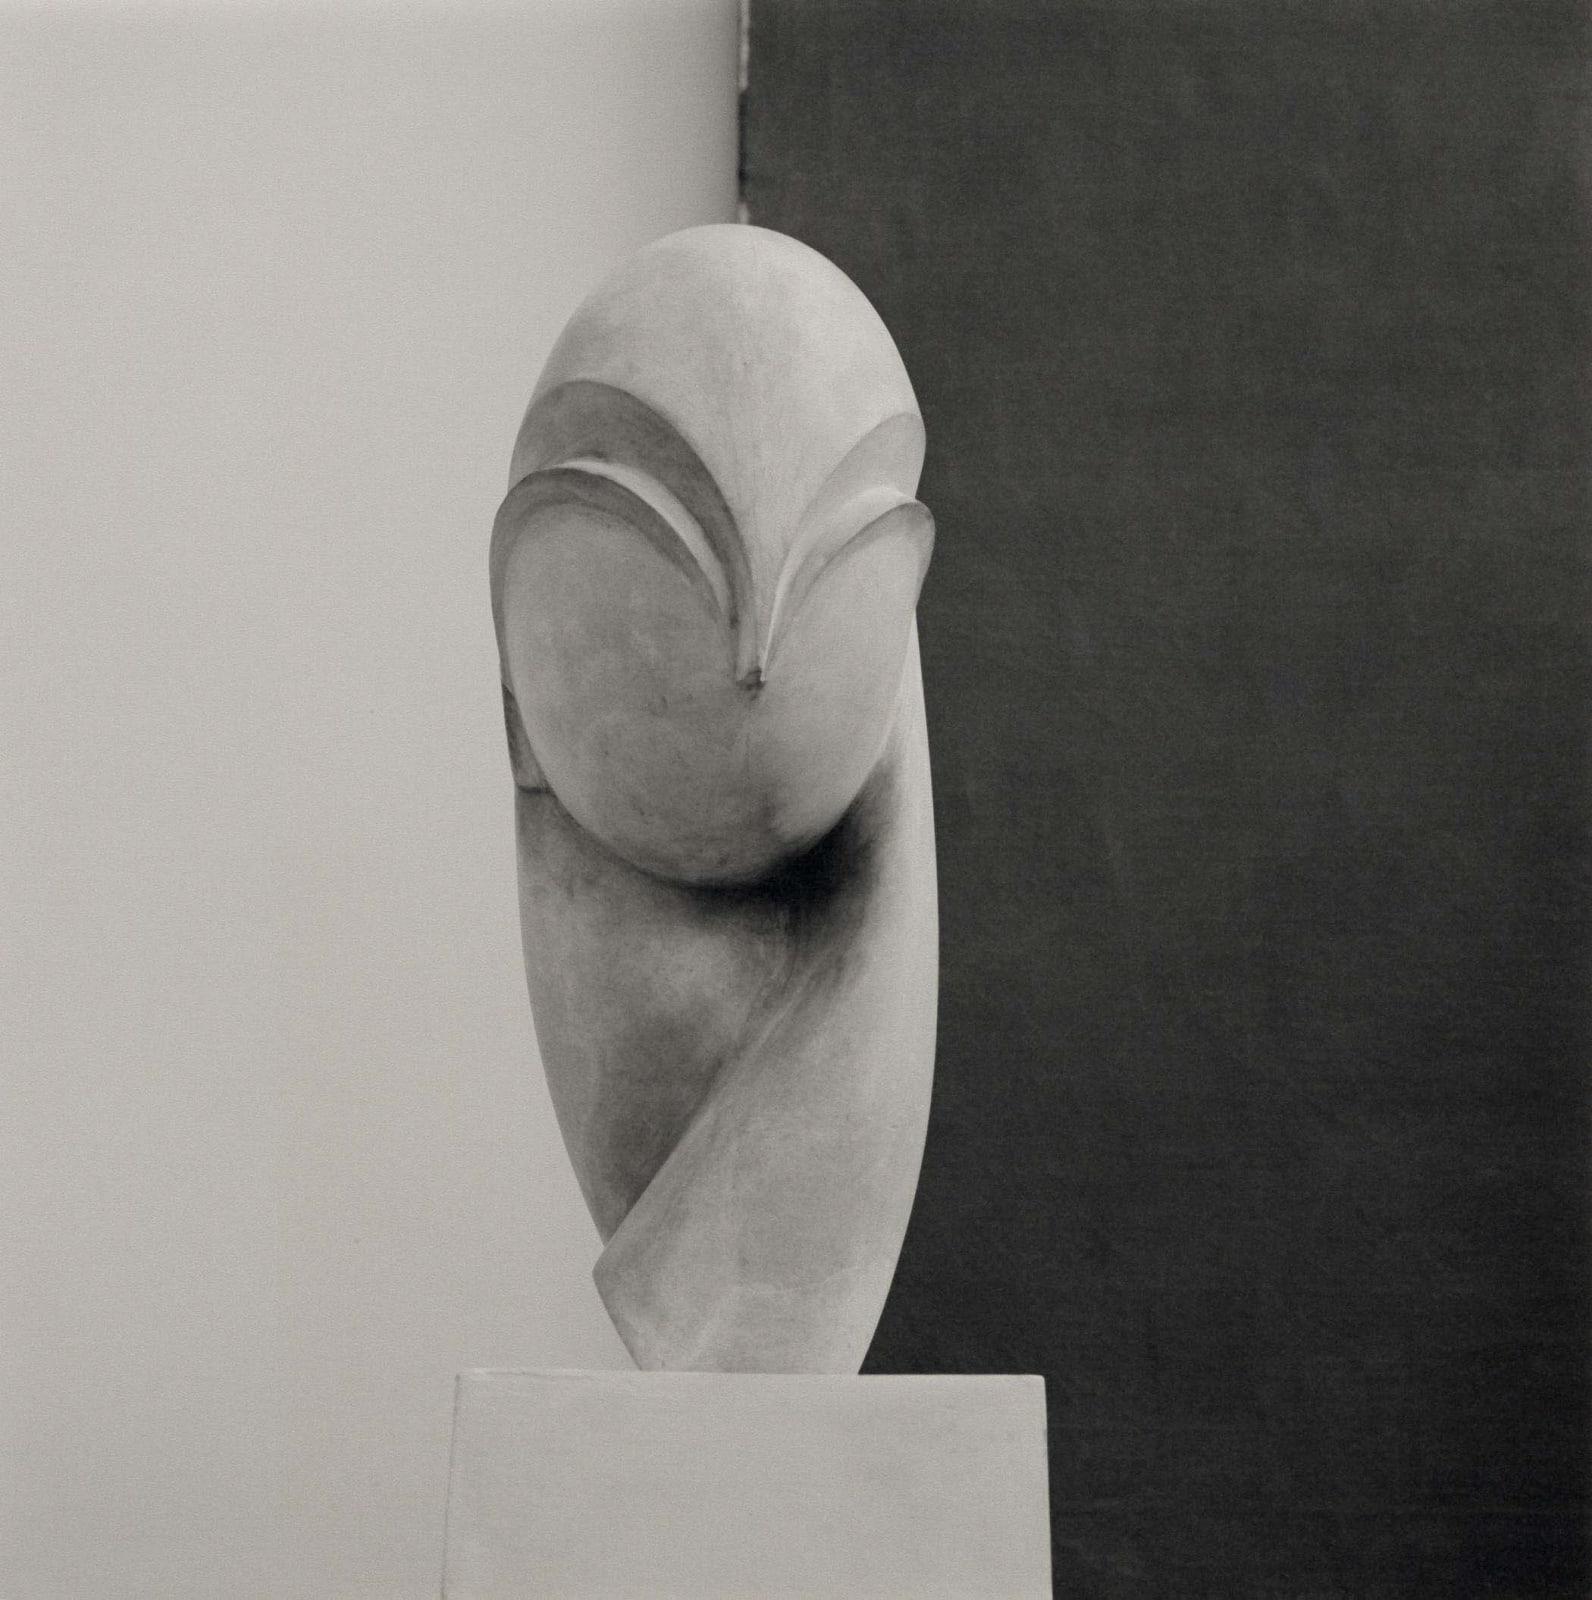 Lynn Davis photograph of Madame Pogany sculpture by Brancusci